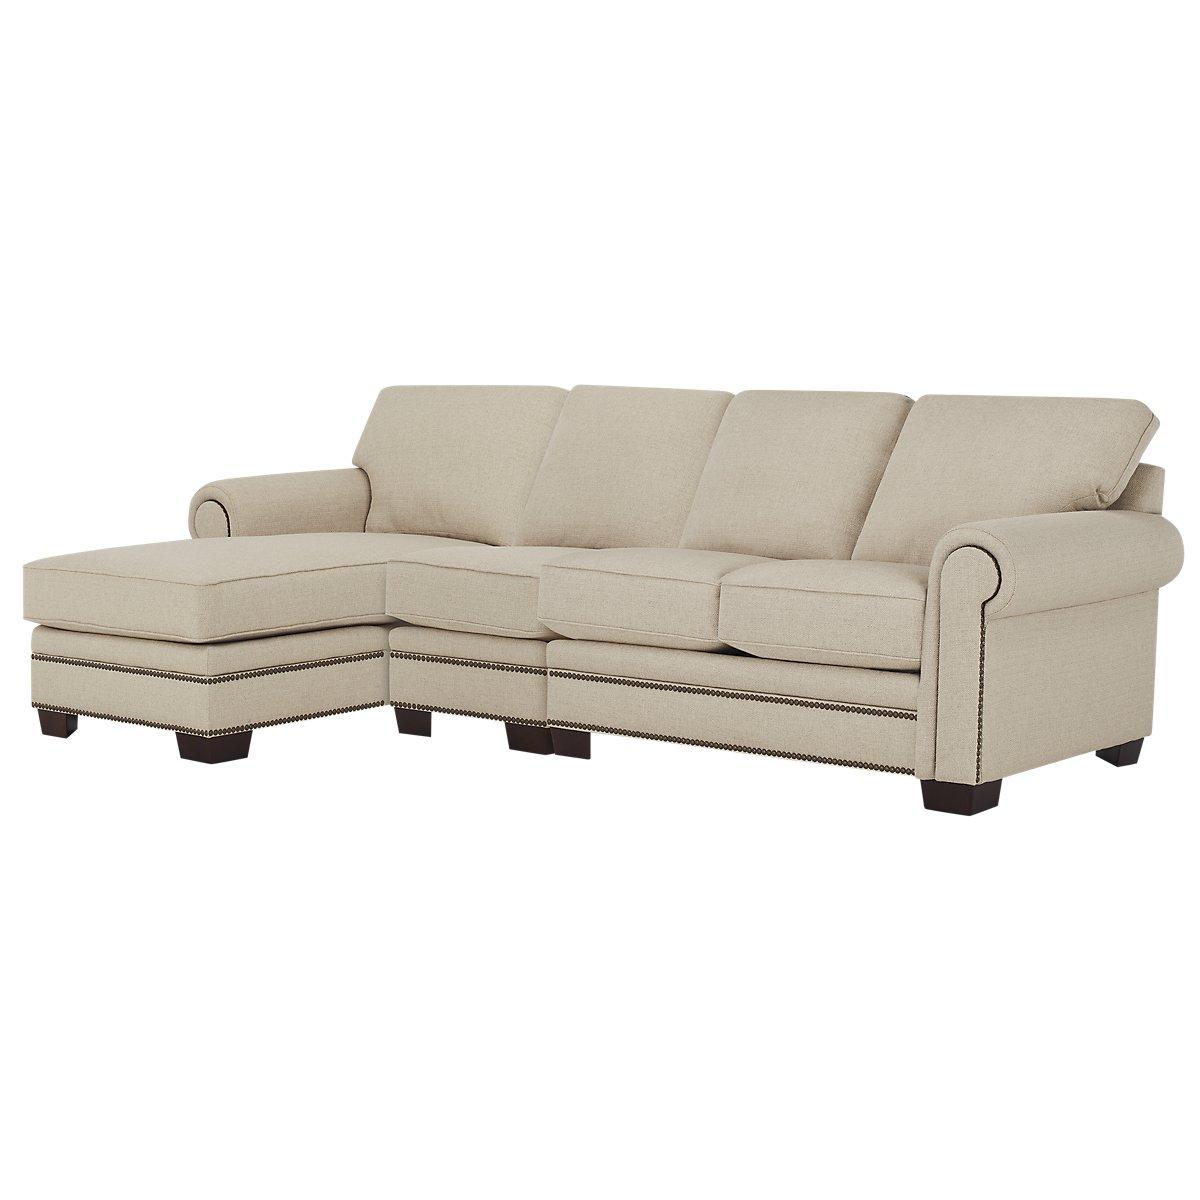 City furniture foster khaki fabric small left chaise for Chaise kaki